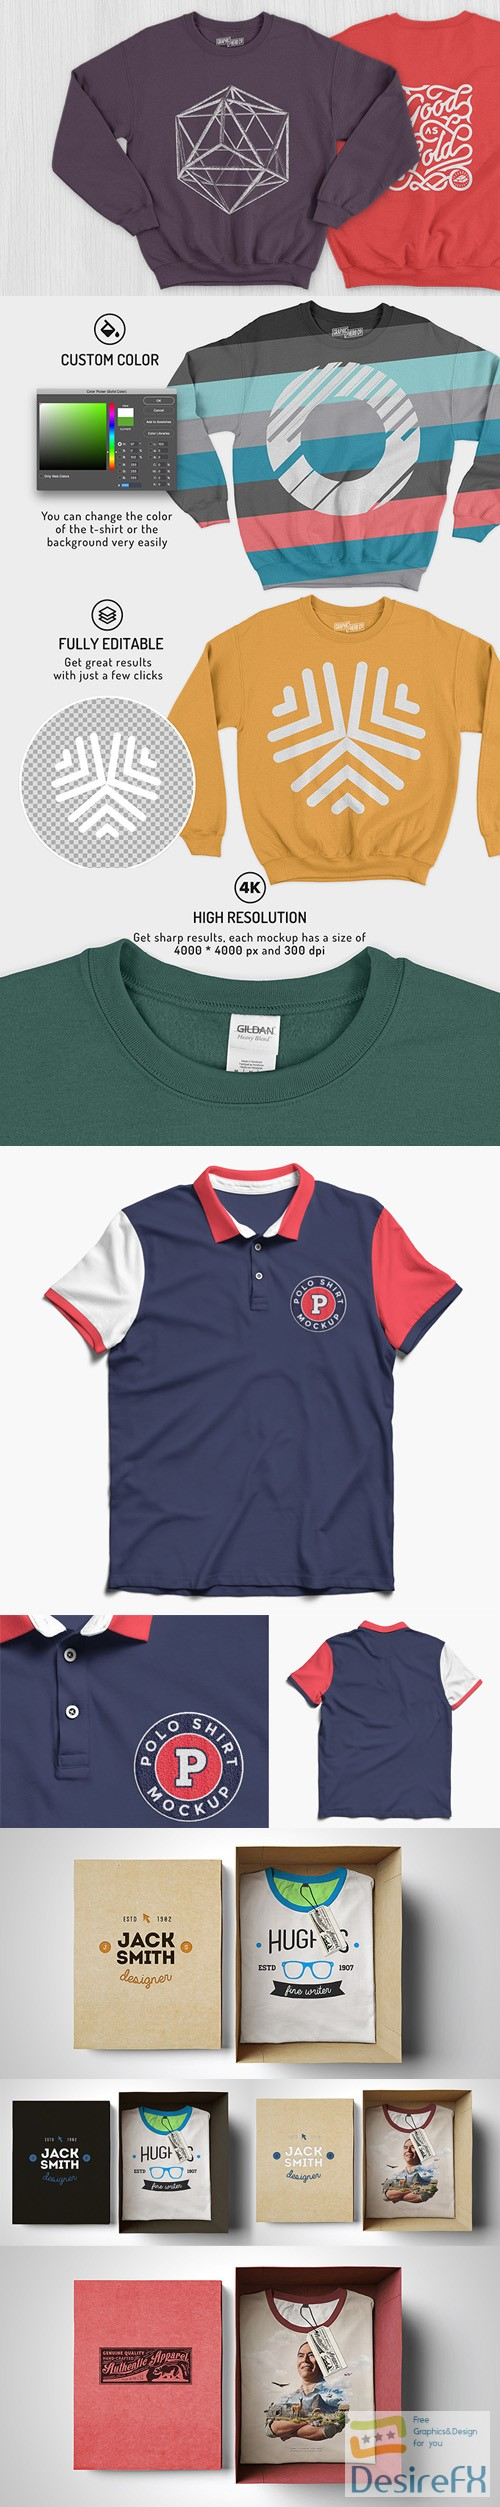 t-shirts-prints - 7 Shirt PSD Mockups Collection